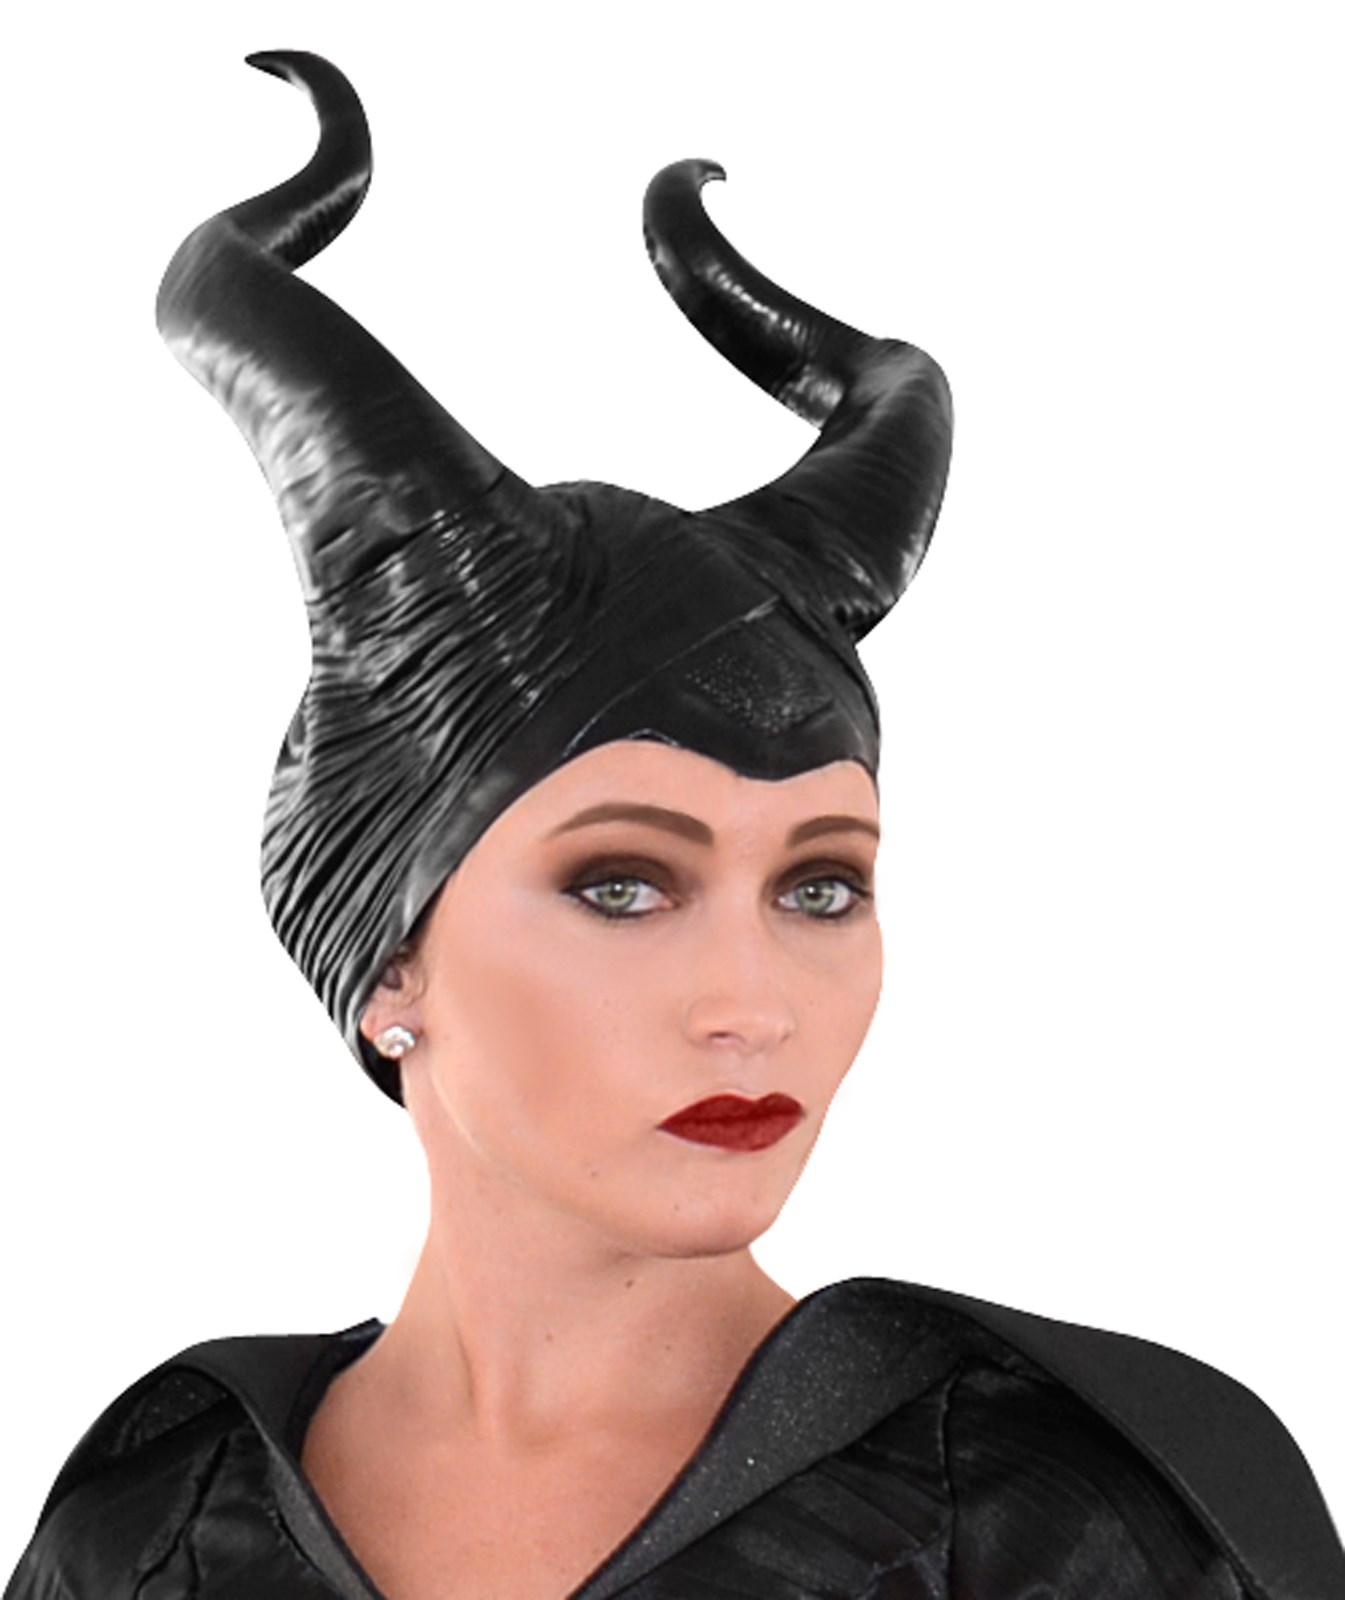 Disney Maleficent - Vinyl Horns Deluxe Headpiece | BuyCostumes.com